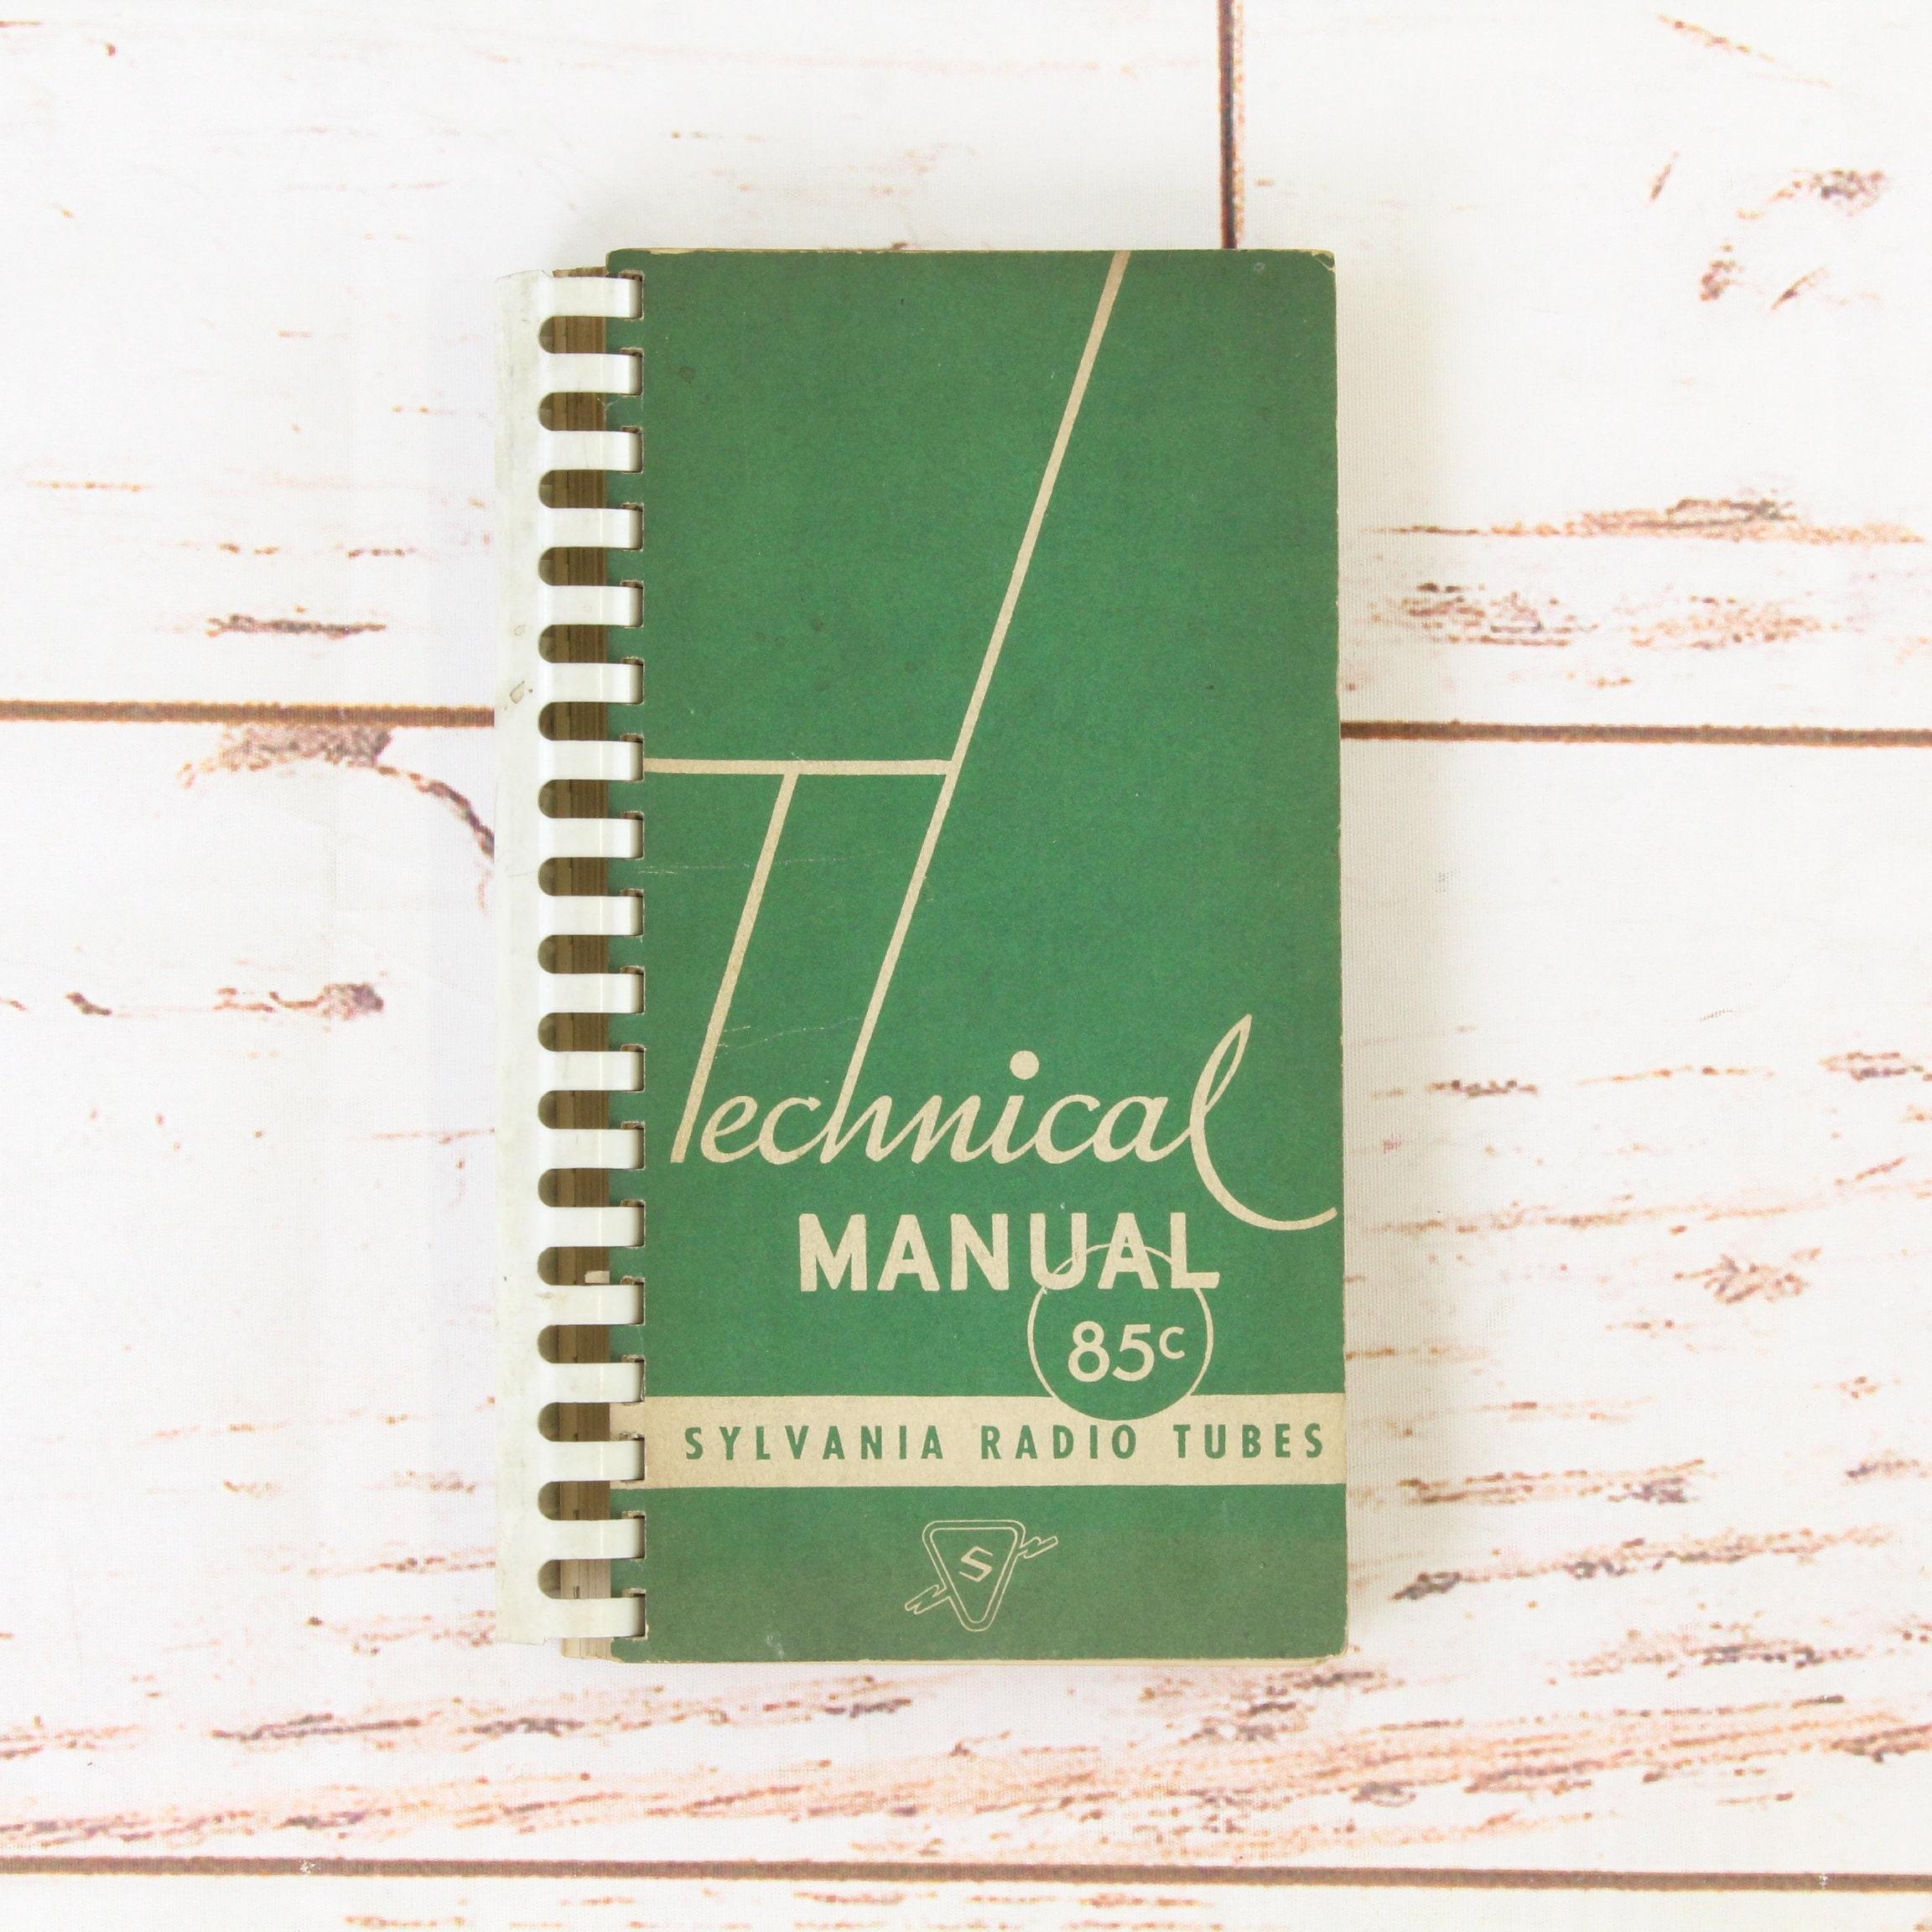 sylvania notebook manual